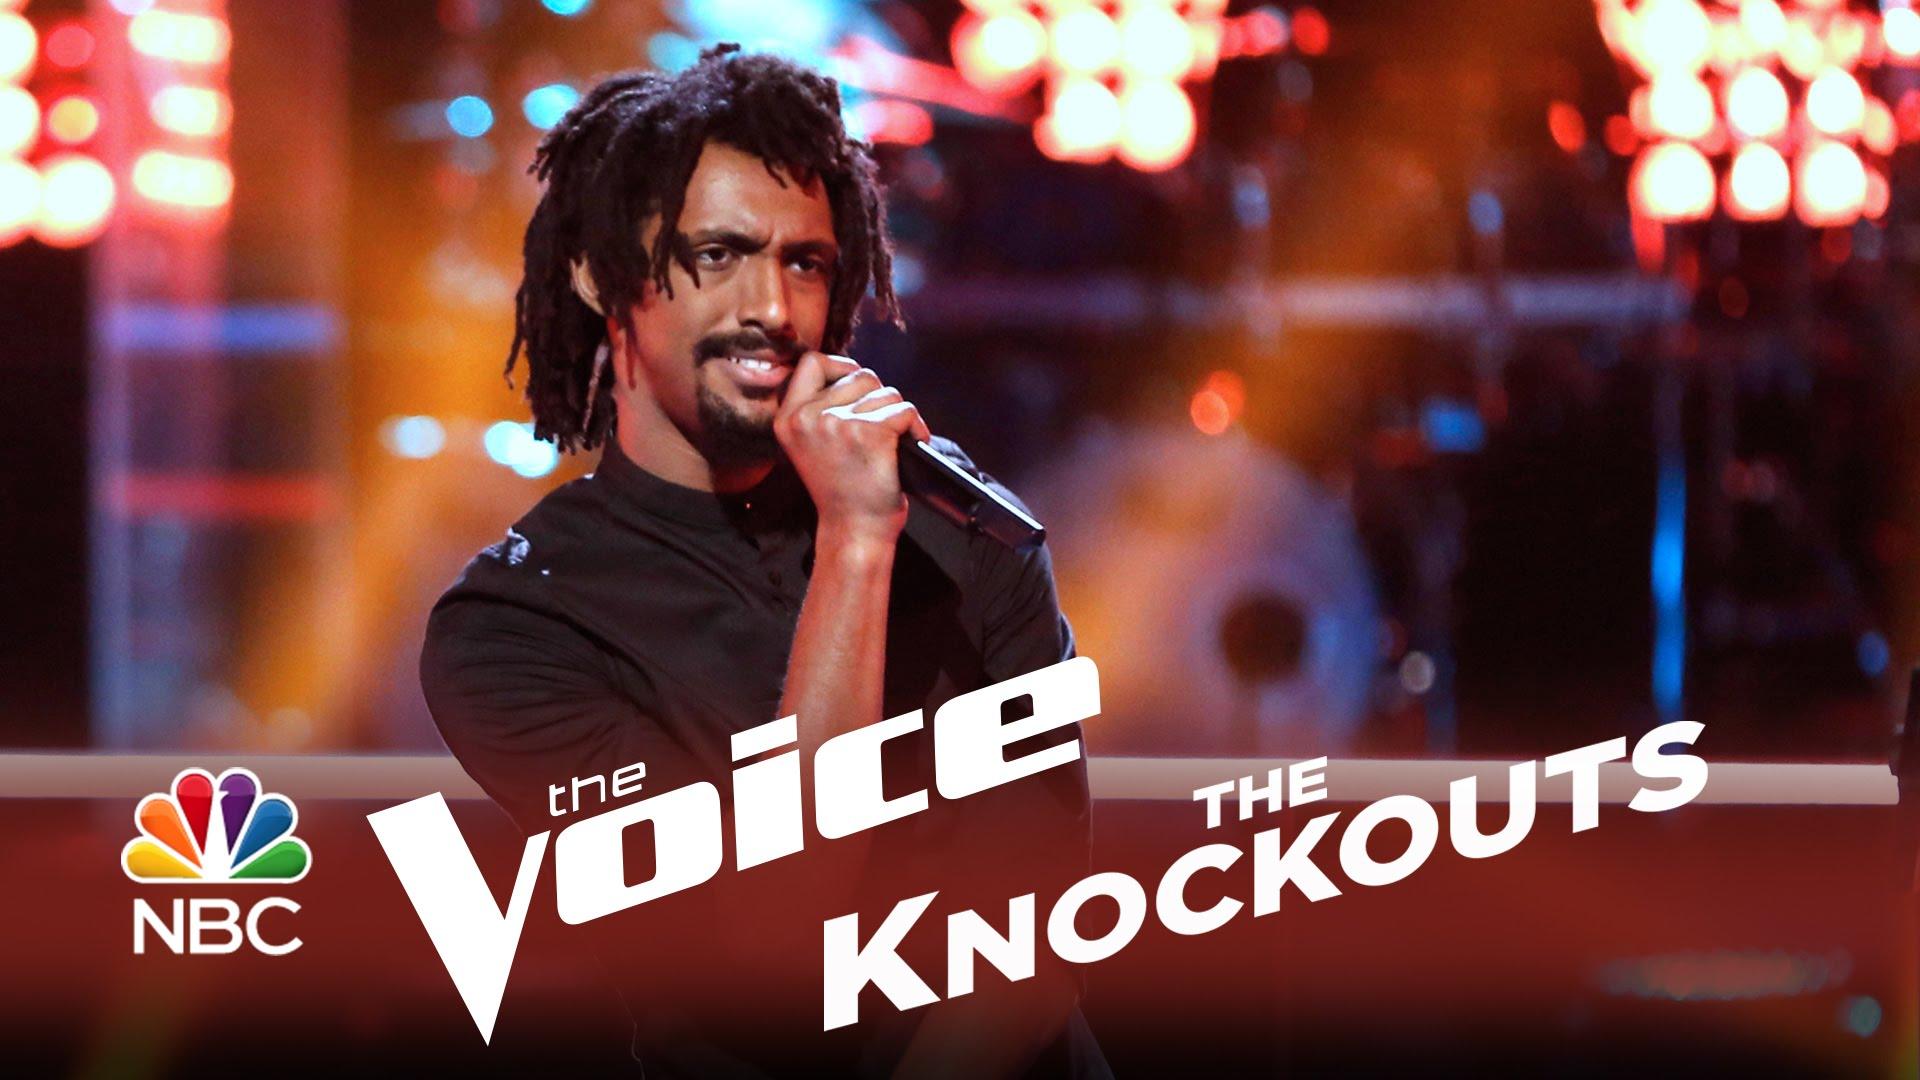 The Voice 2014 - Knockouts - Menlik Zergabachew Continues to Impress the Voice